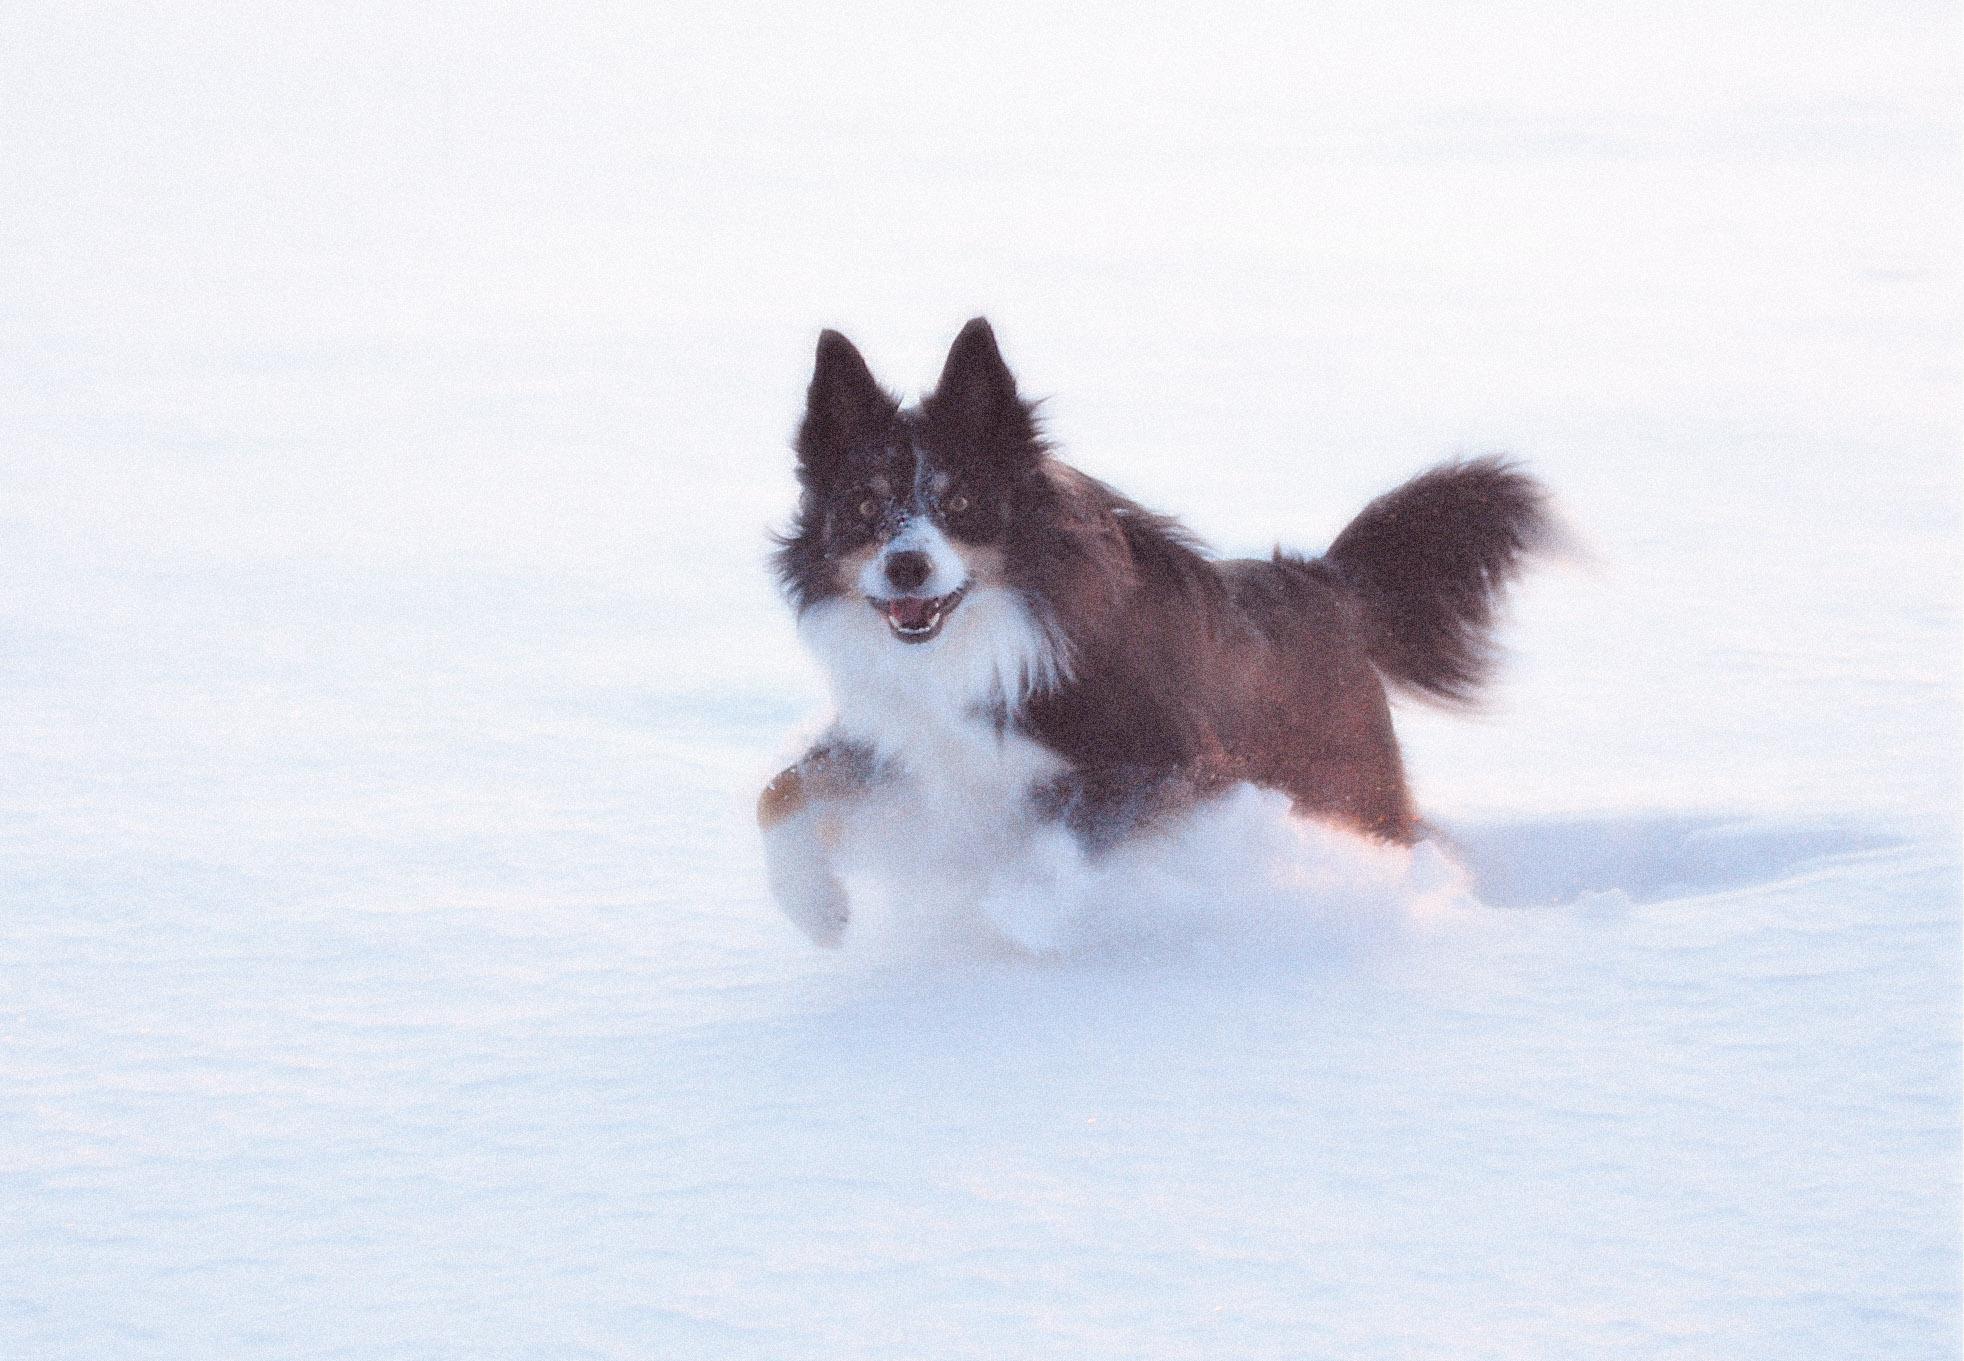 SnowMick